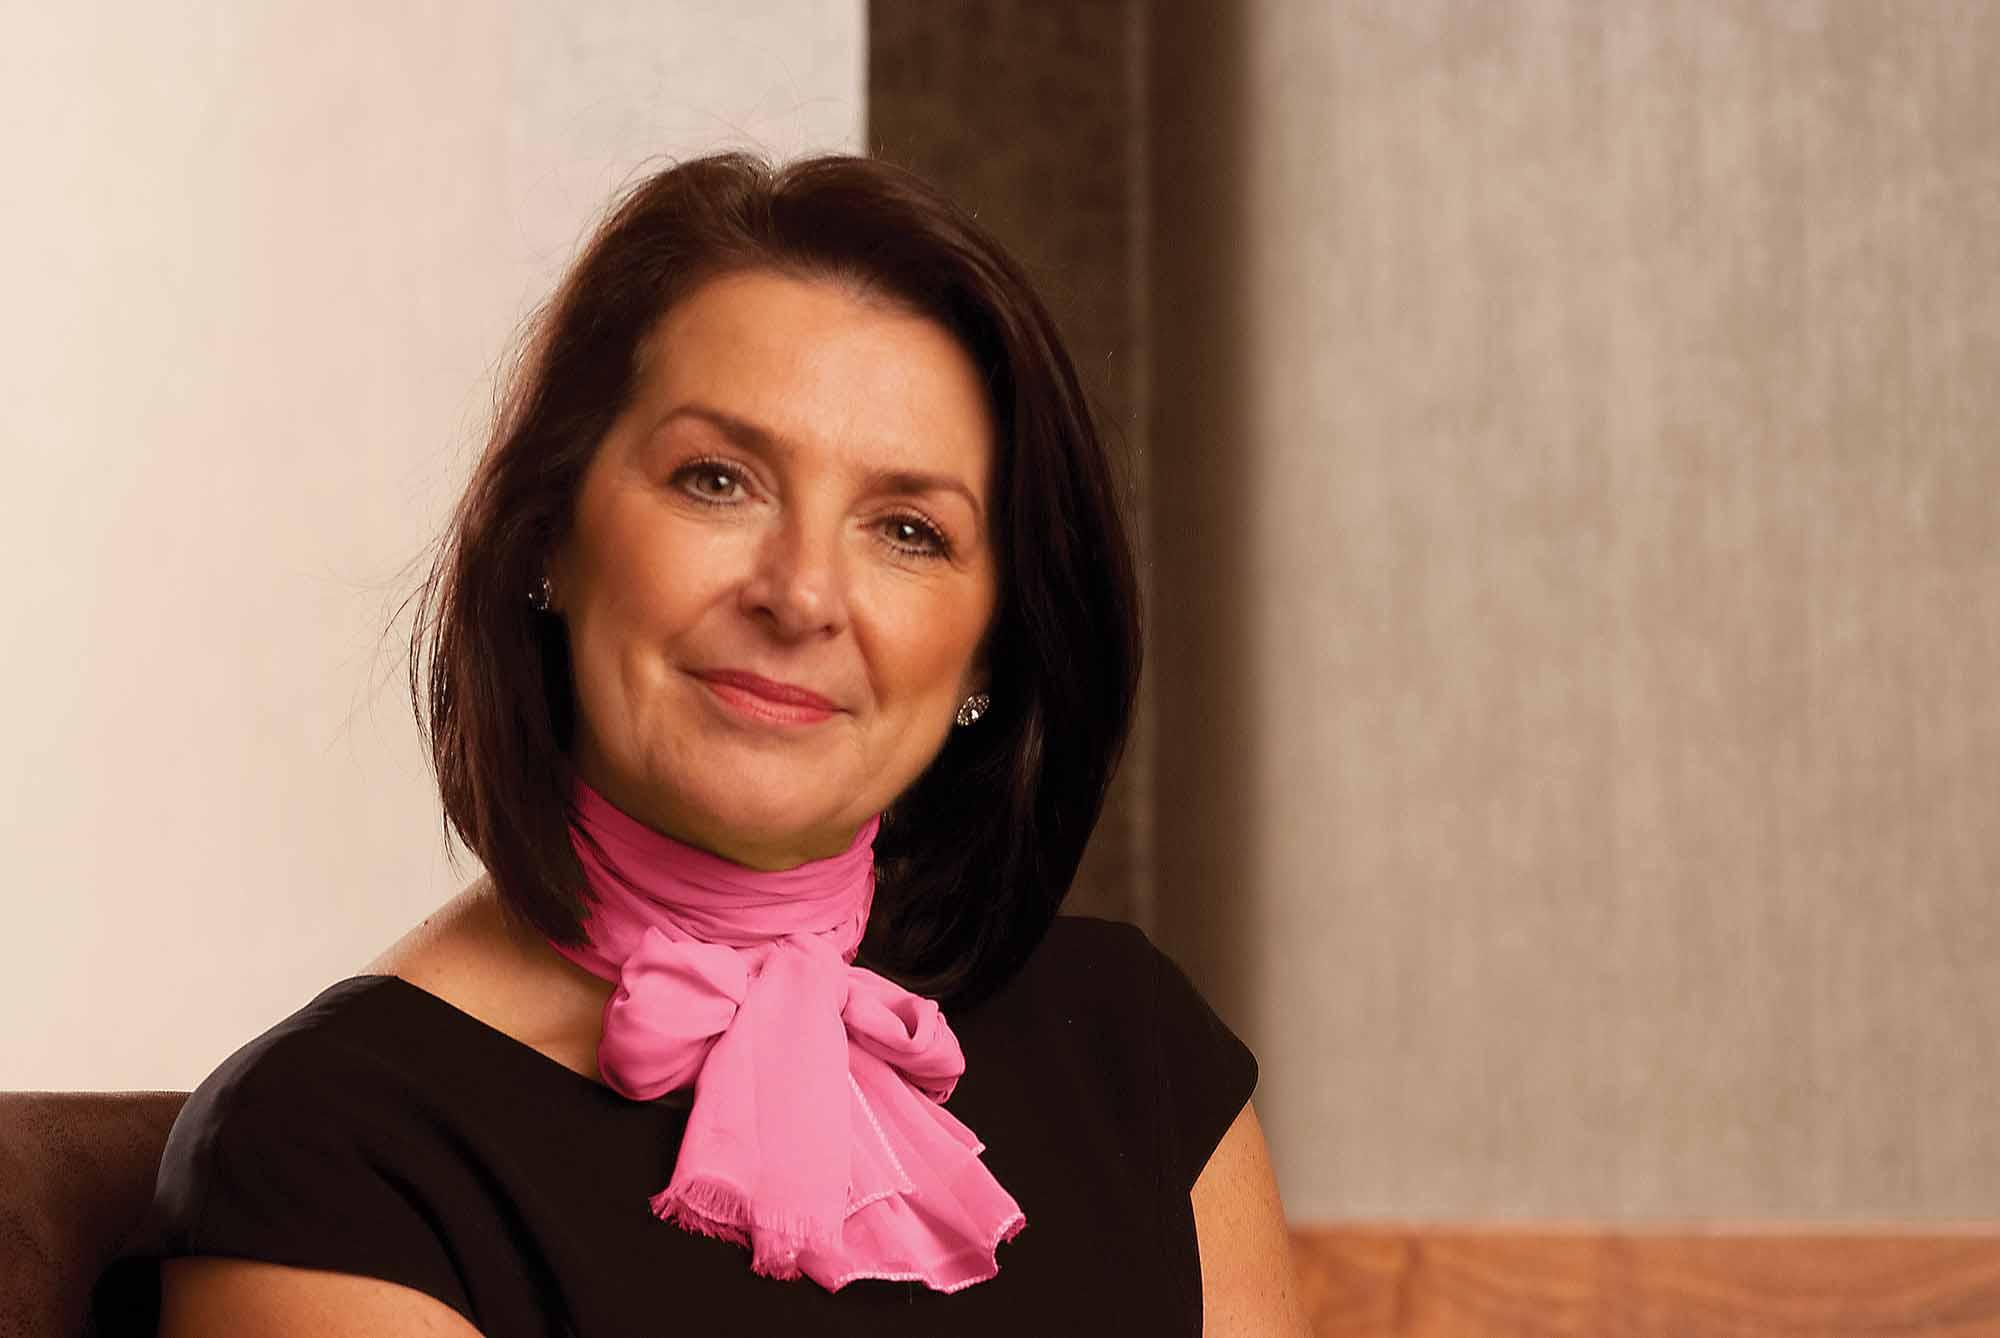 Maureen McInnes